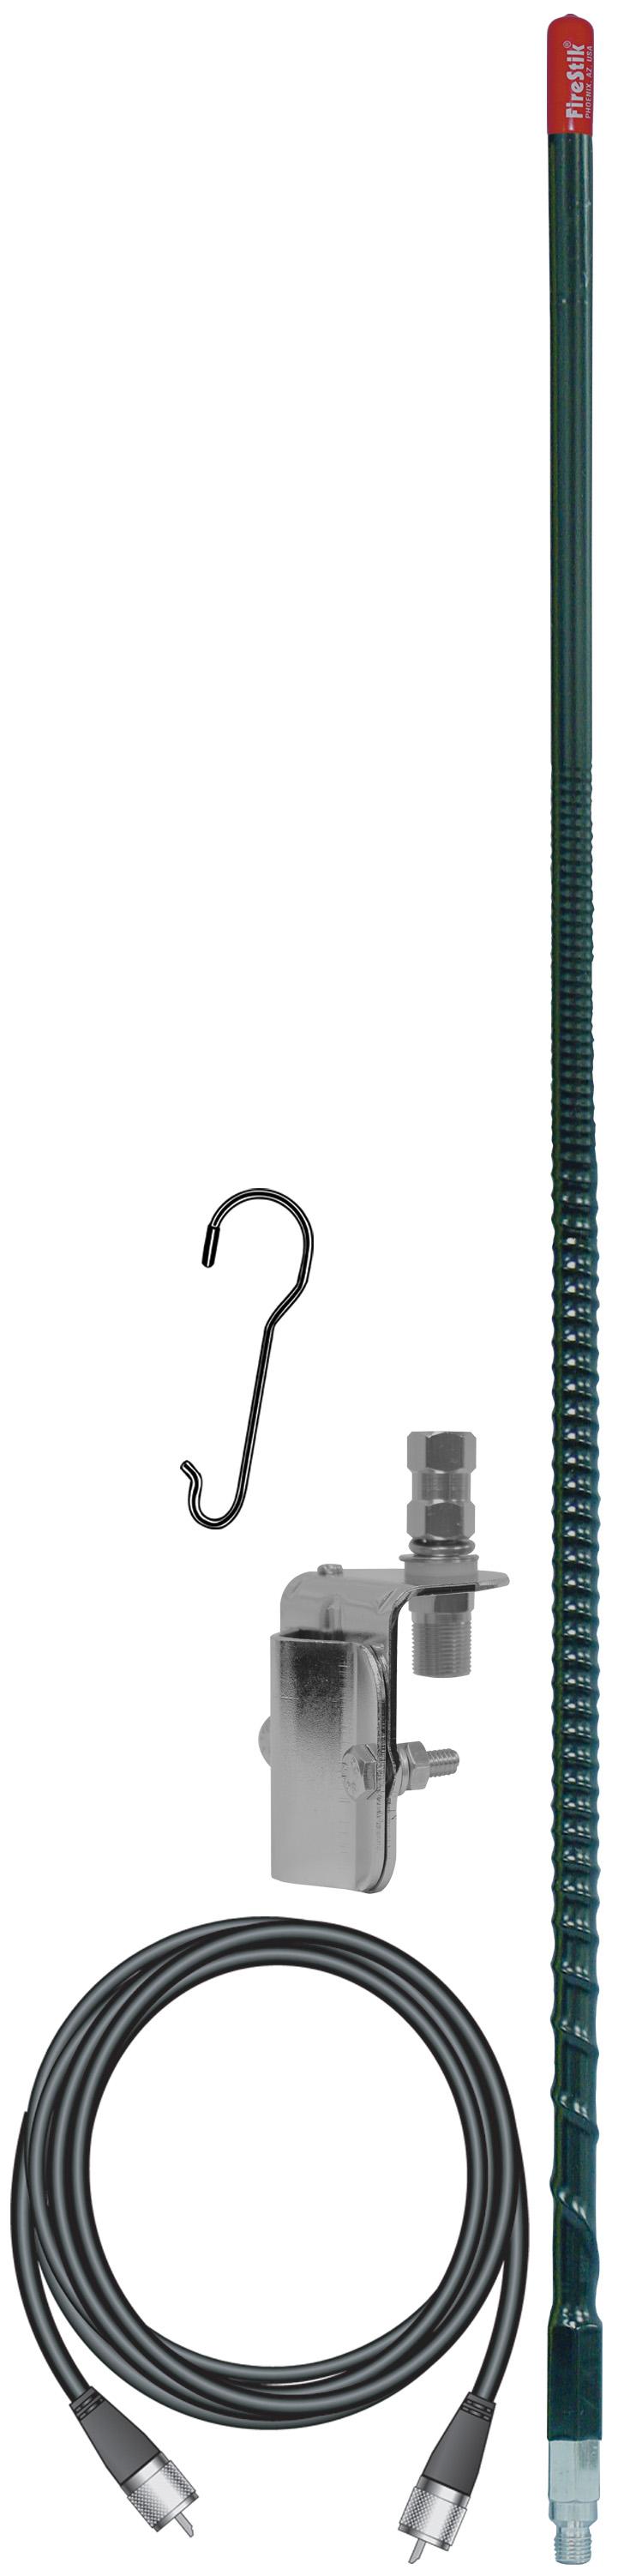 KW4SMK-B - Firestik 4' Single Mirror Mount CB Antenna Kit (Black)